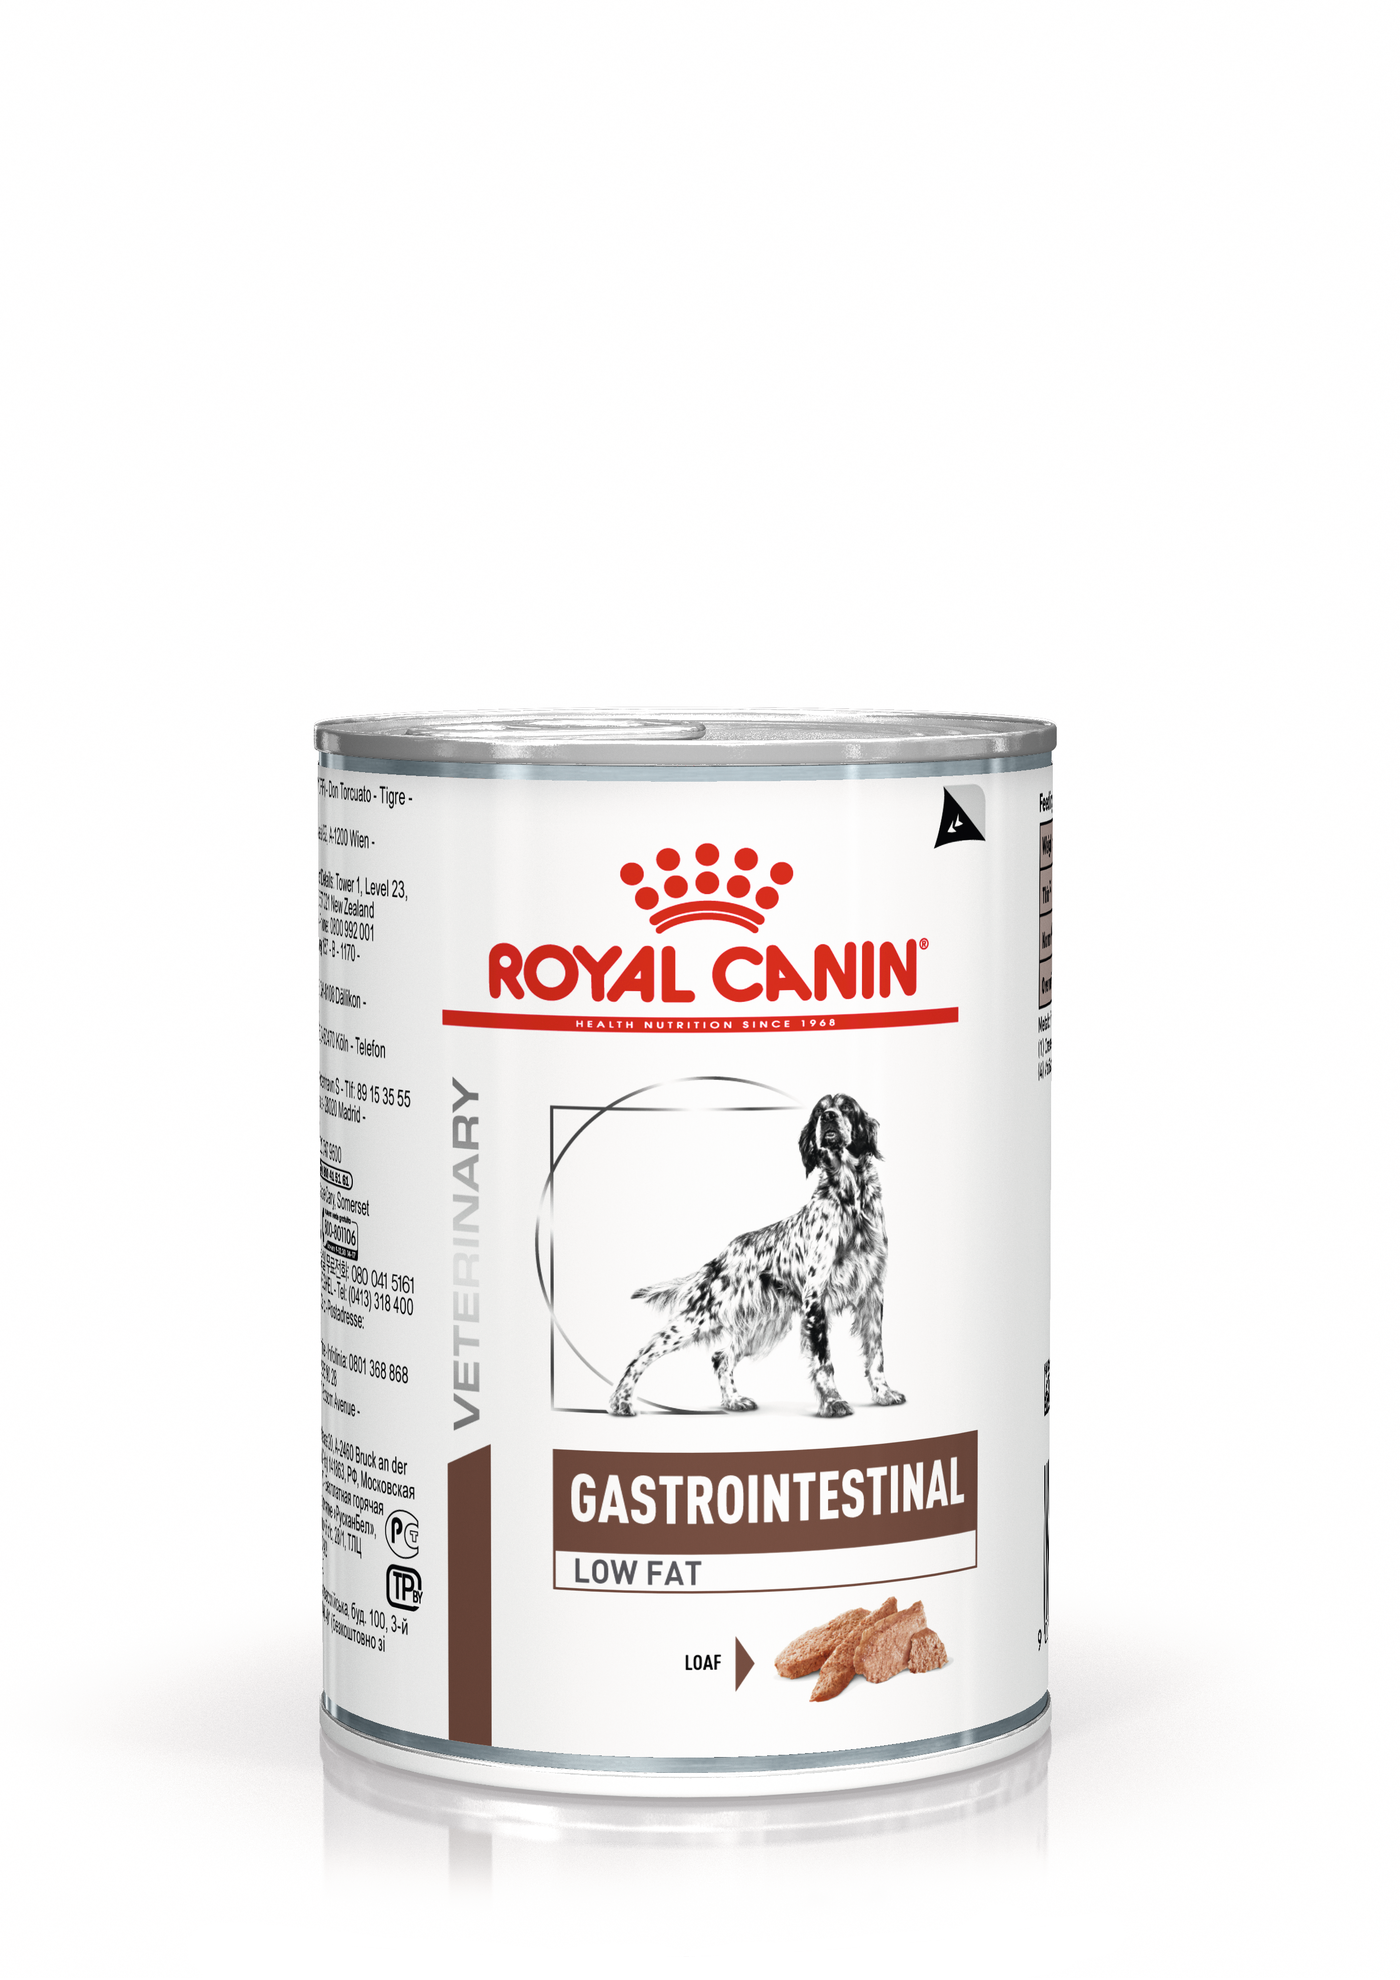 Gastrointestinal Low Fat (паштет) product image